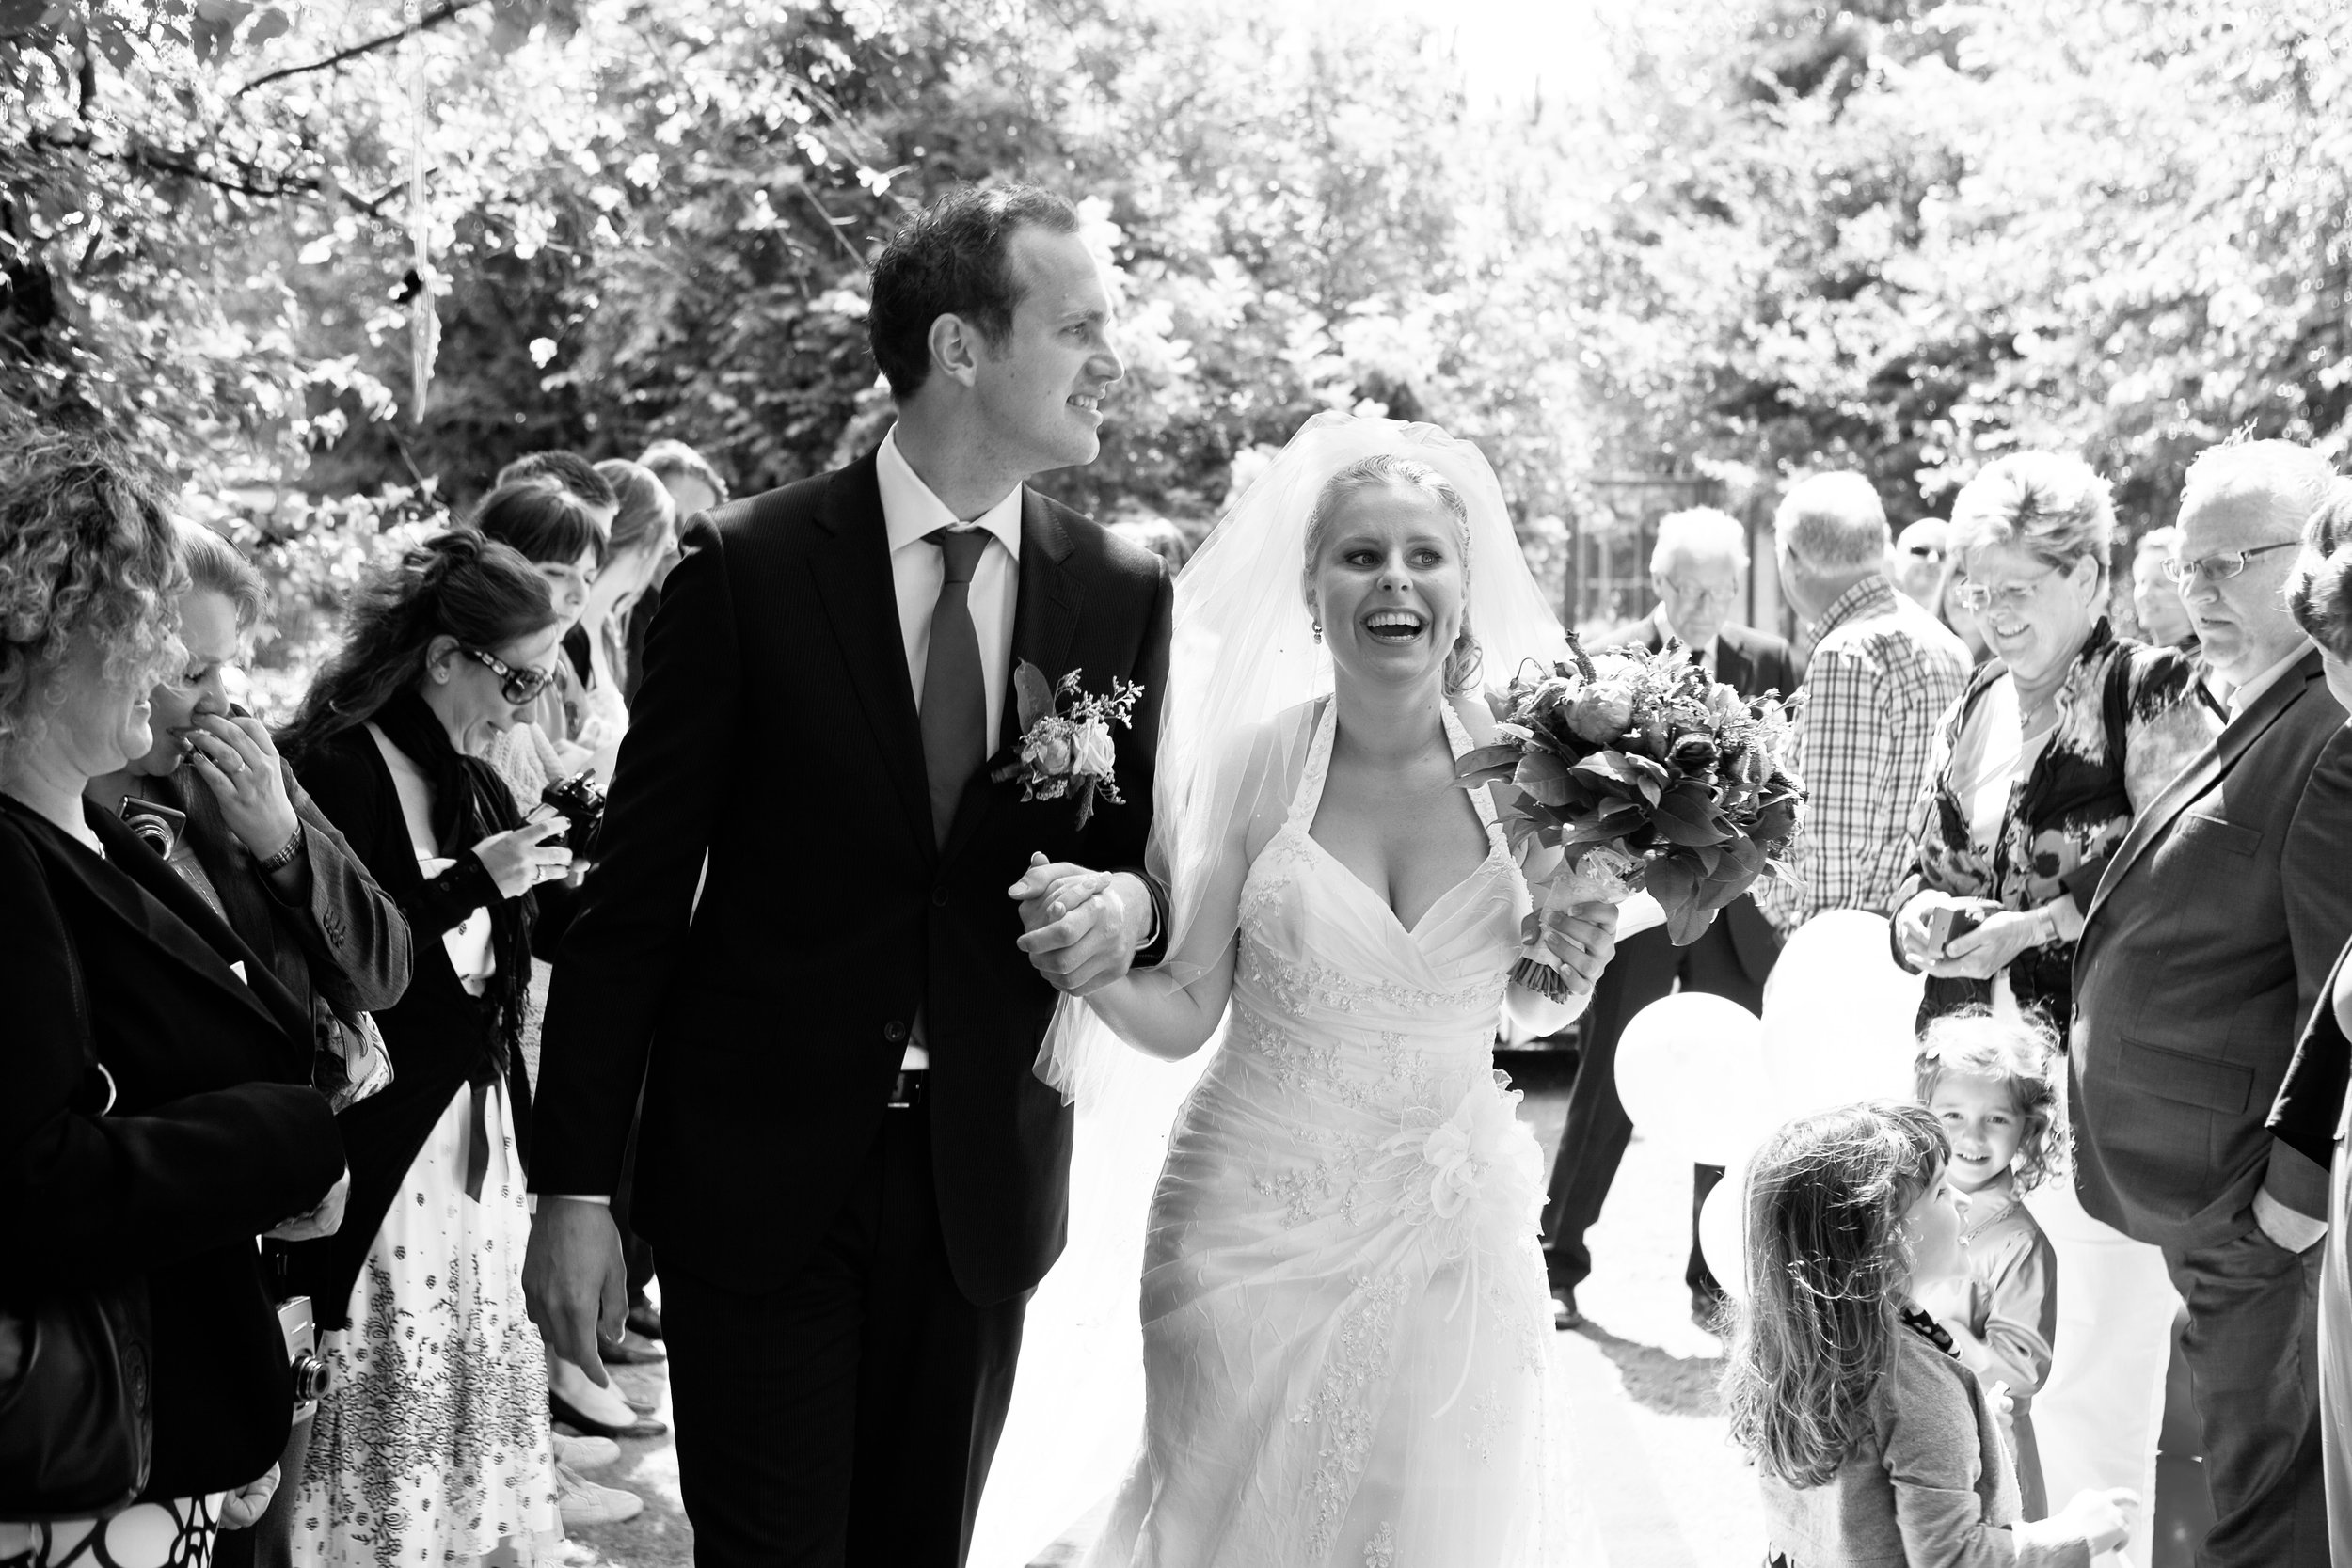 trouwshoot-bruidsfotografie-trouwfoto-feestfotografie-trouwreportage-Laurens en Bettiana564.jpg